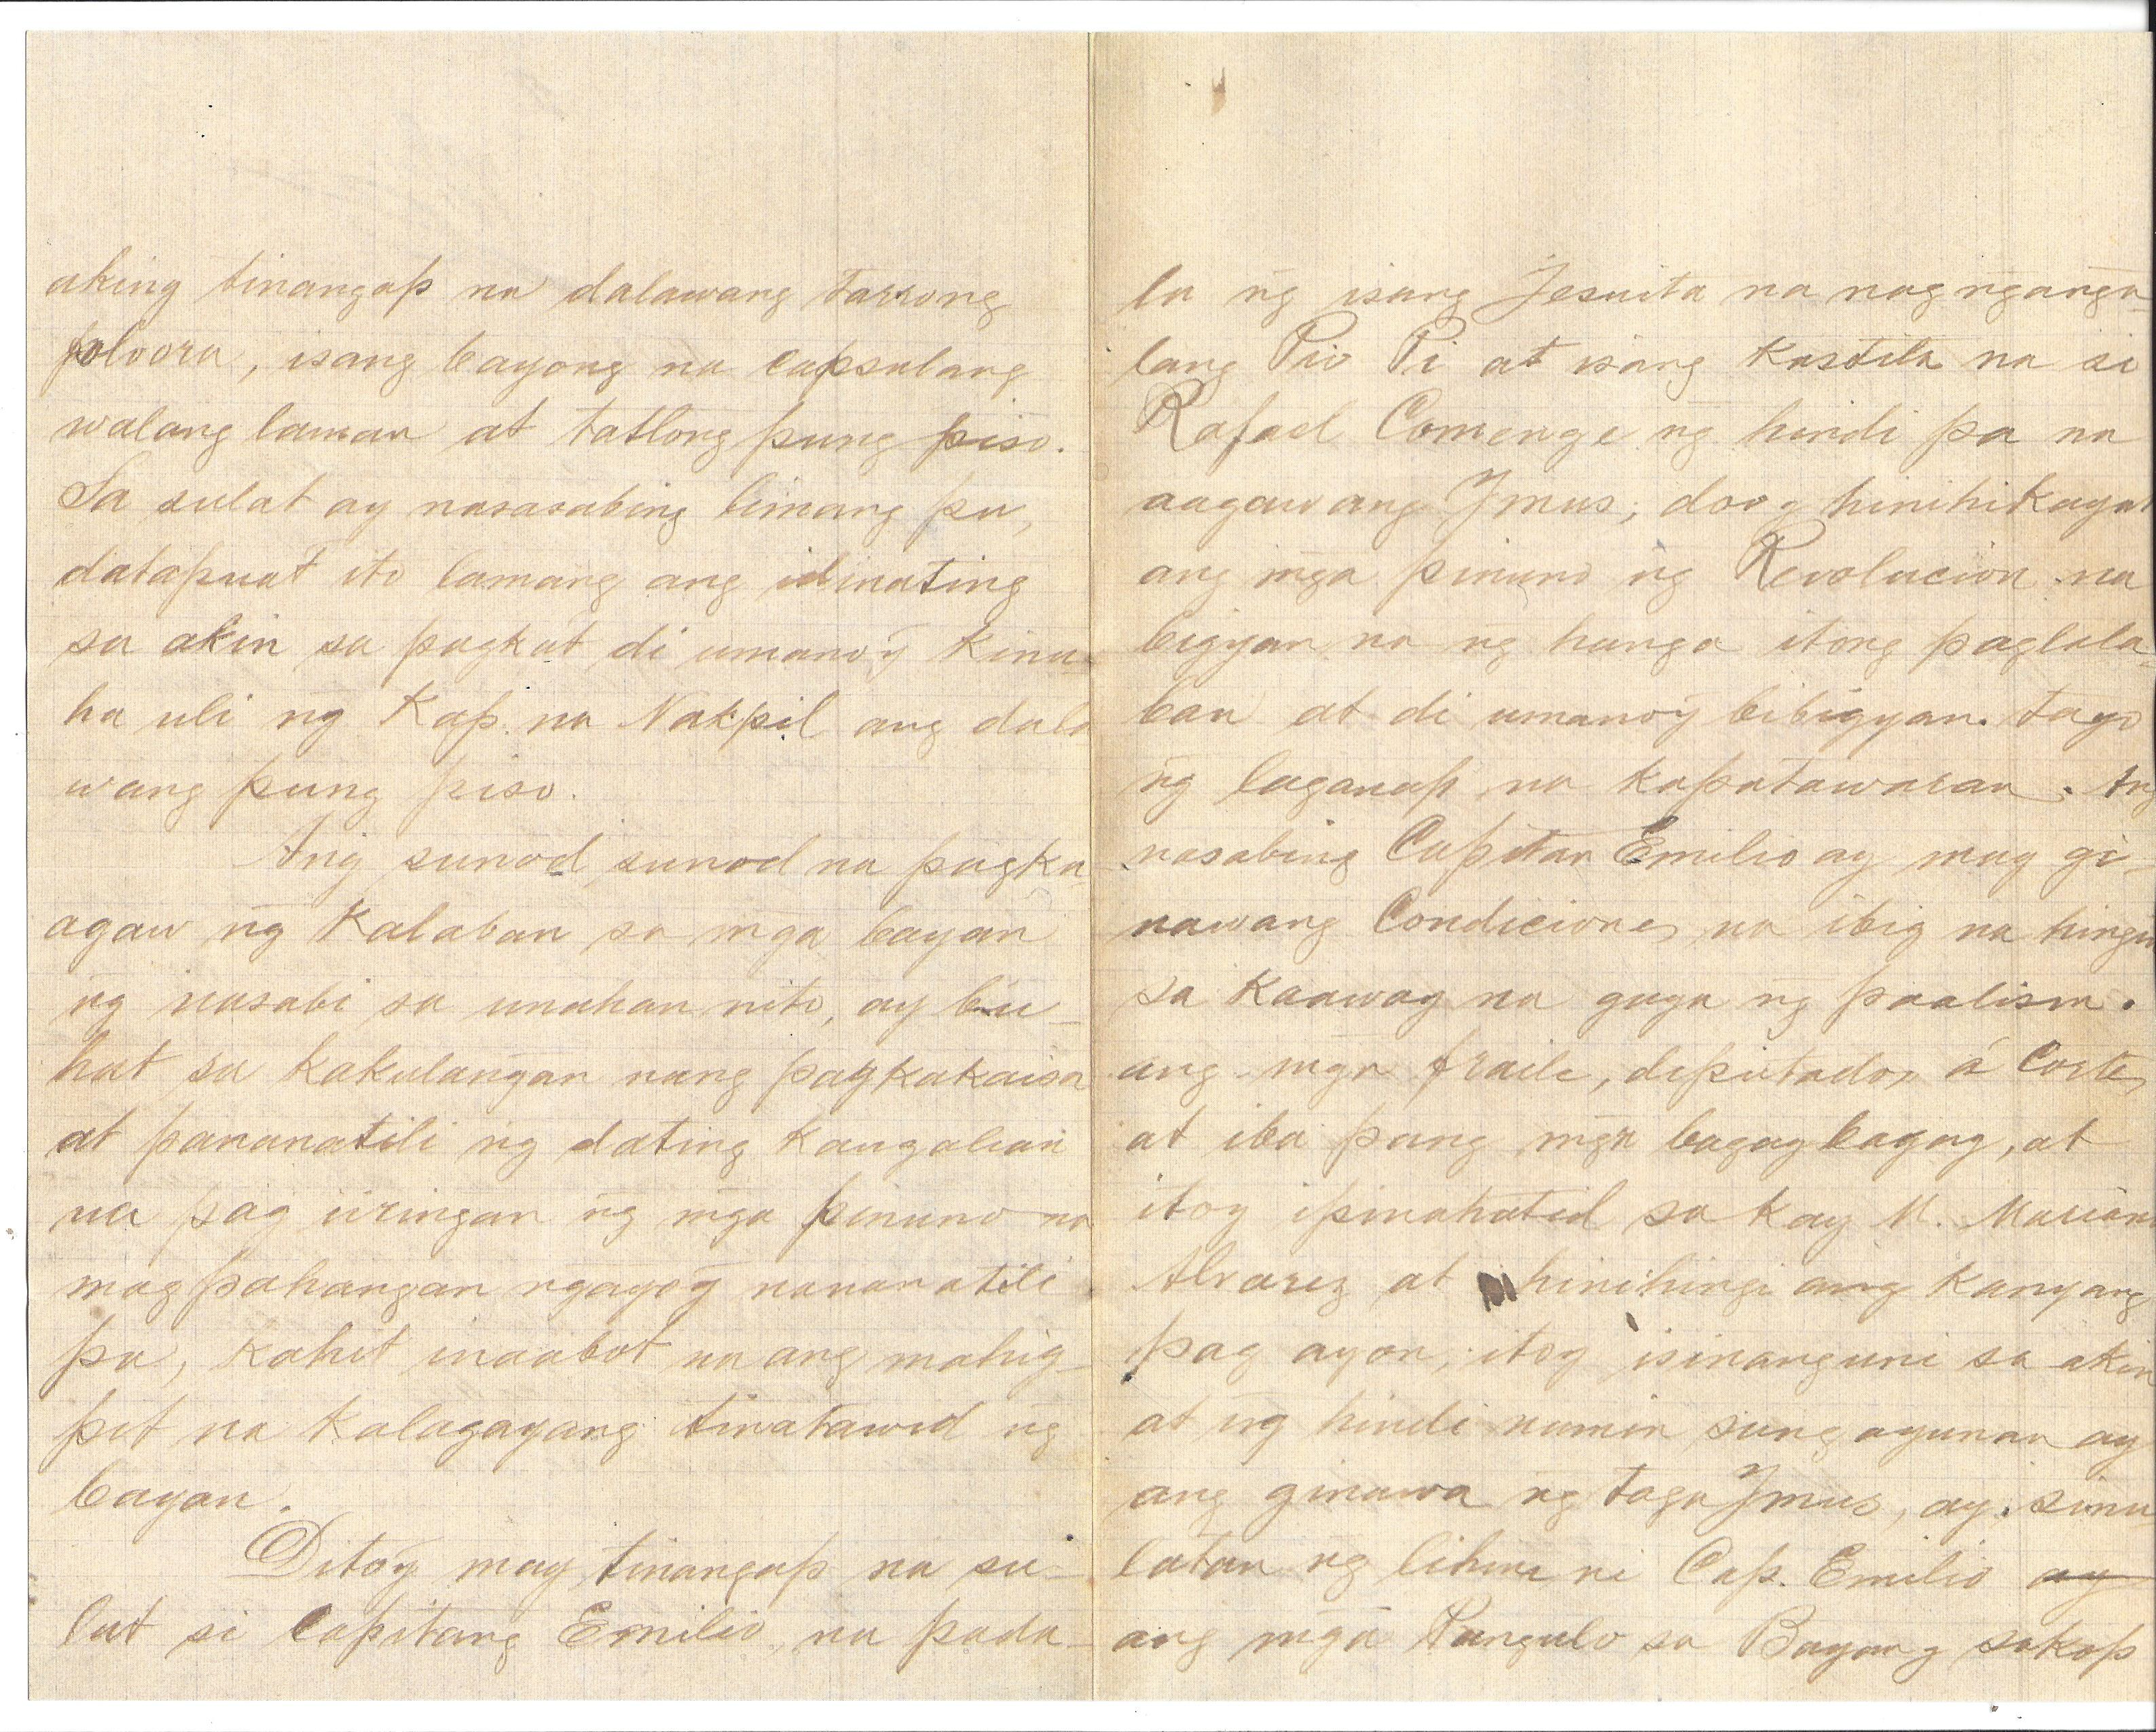 1897-04-16 Bonifacio to Jacinto page 2-3